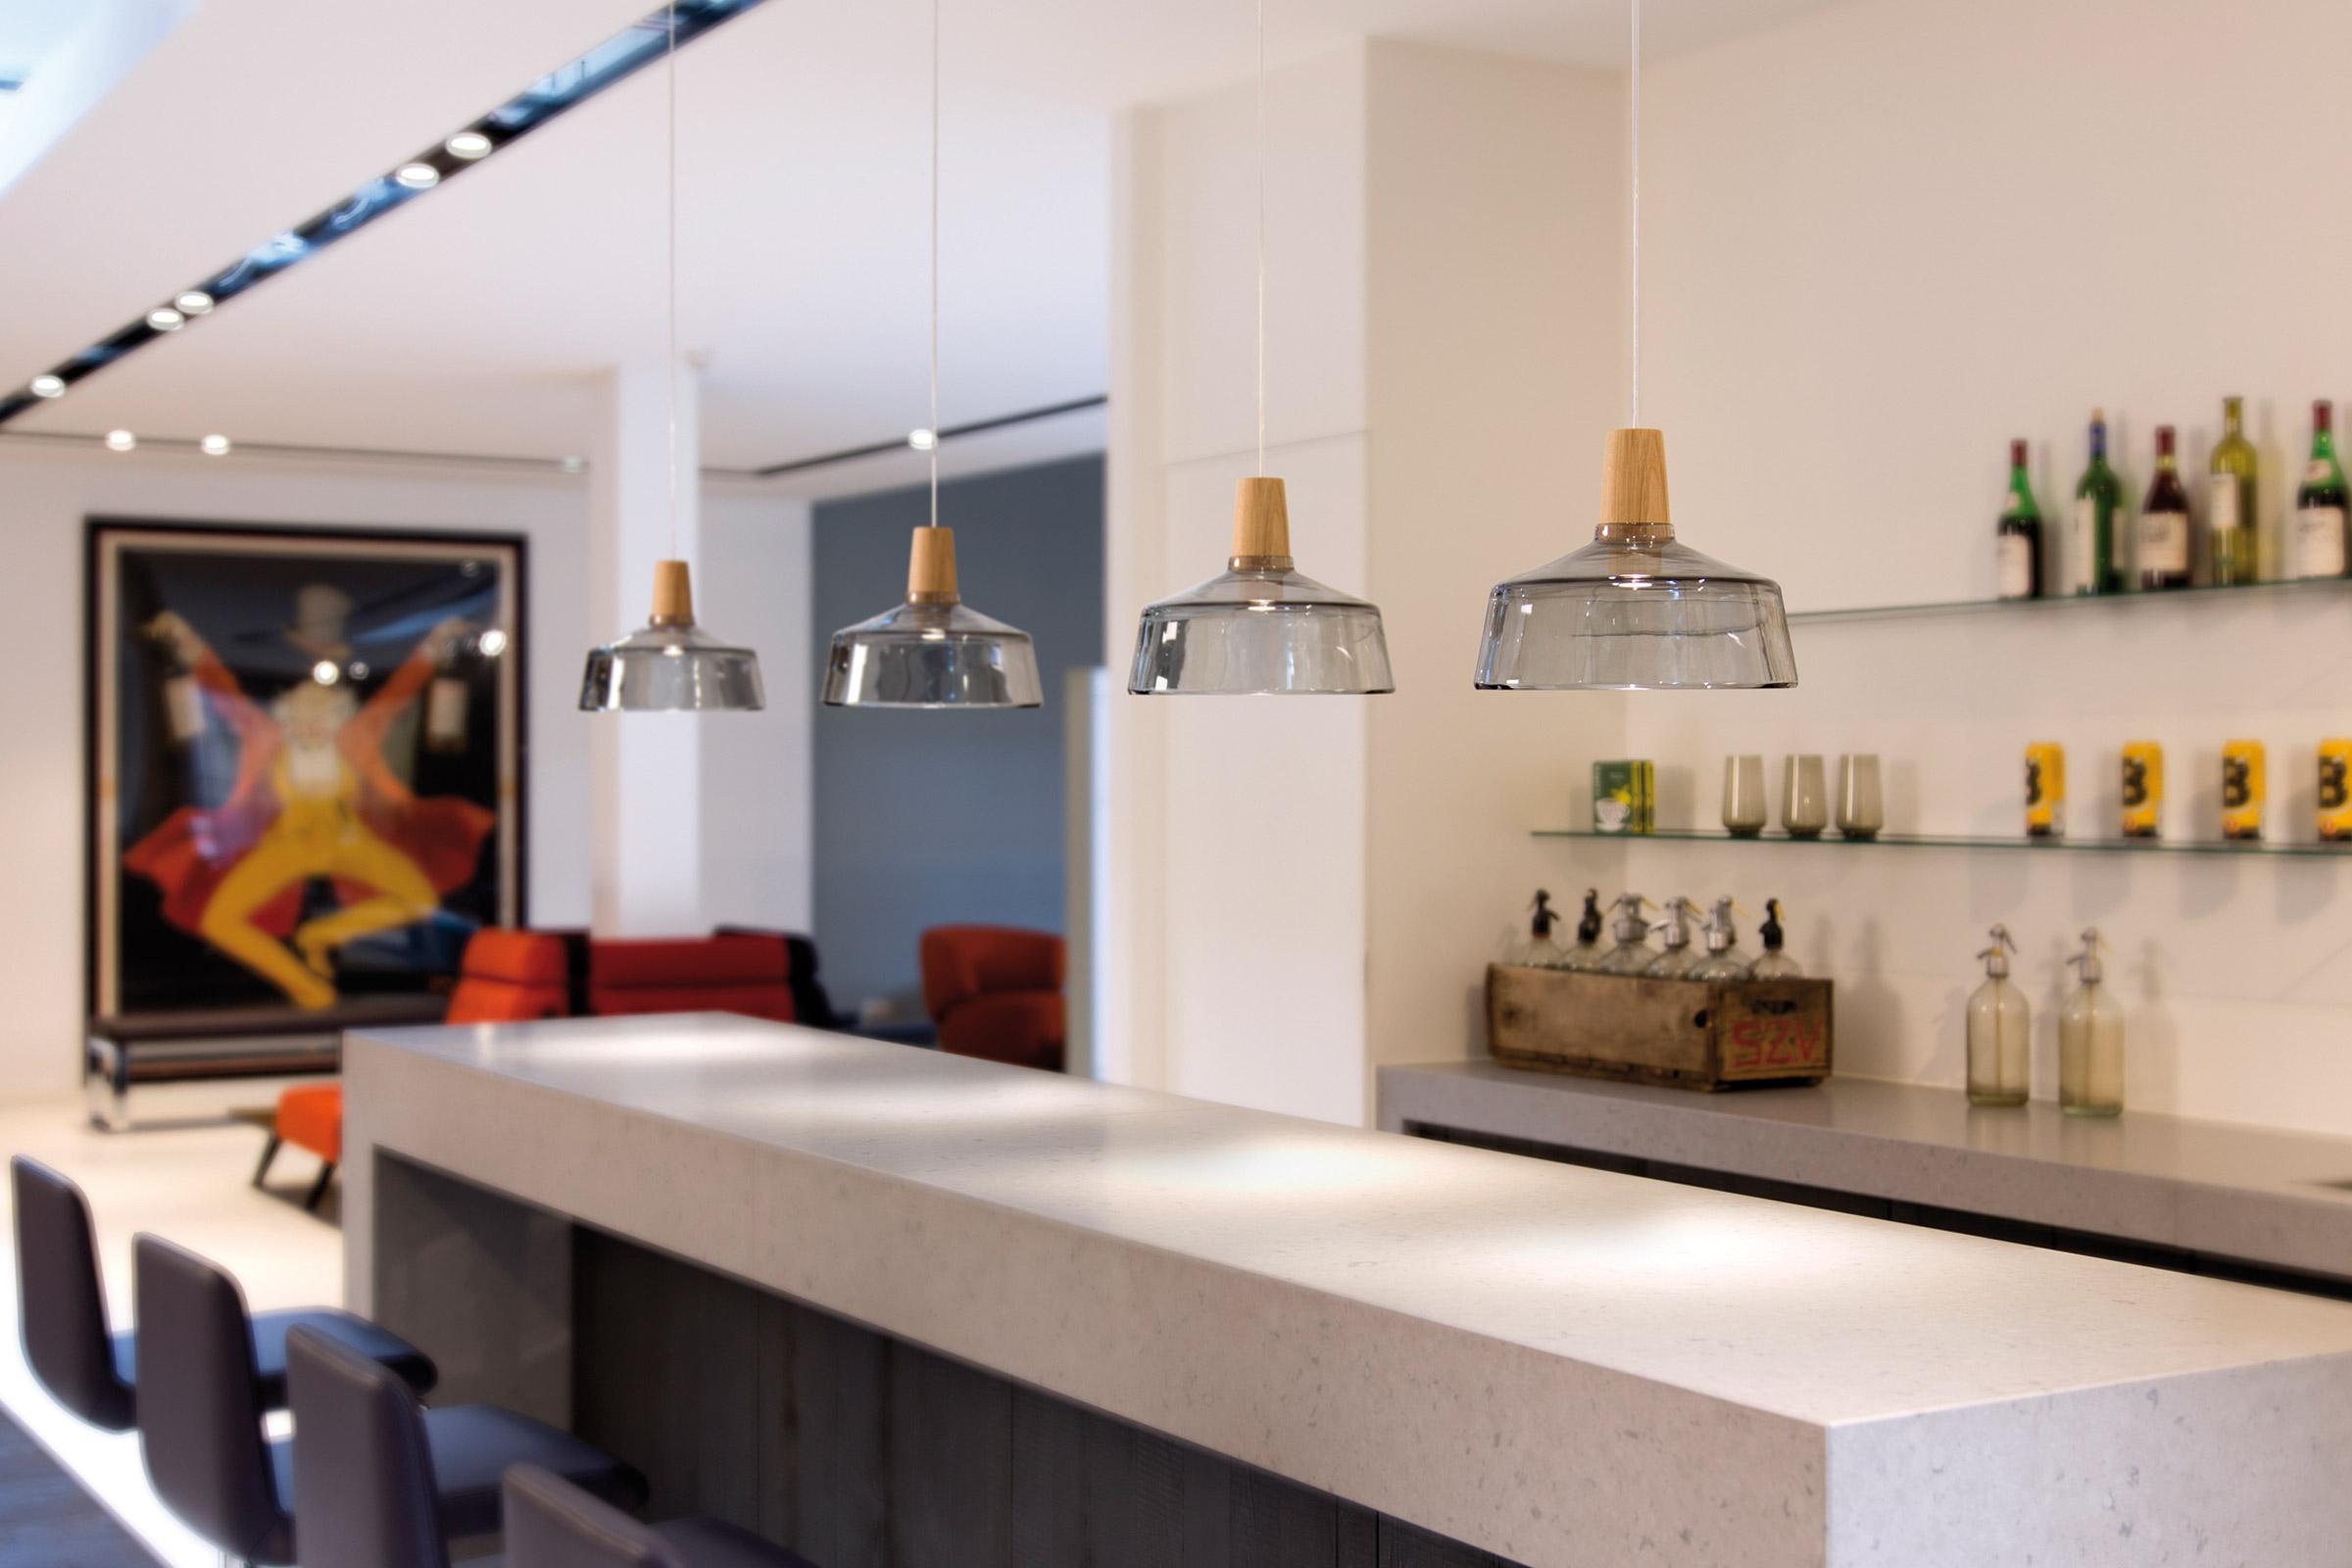 pendelleuchte industrial 26 14p von dreizehngrad. Black Bedroom Furniture Sets. Home Design Ideas